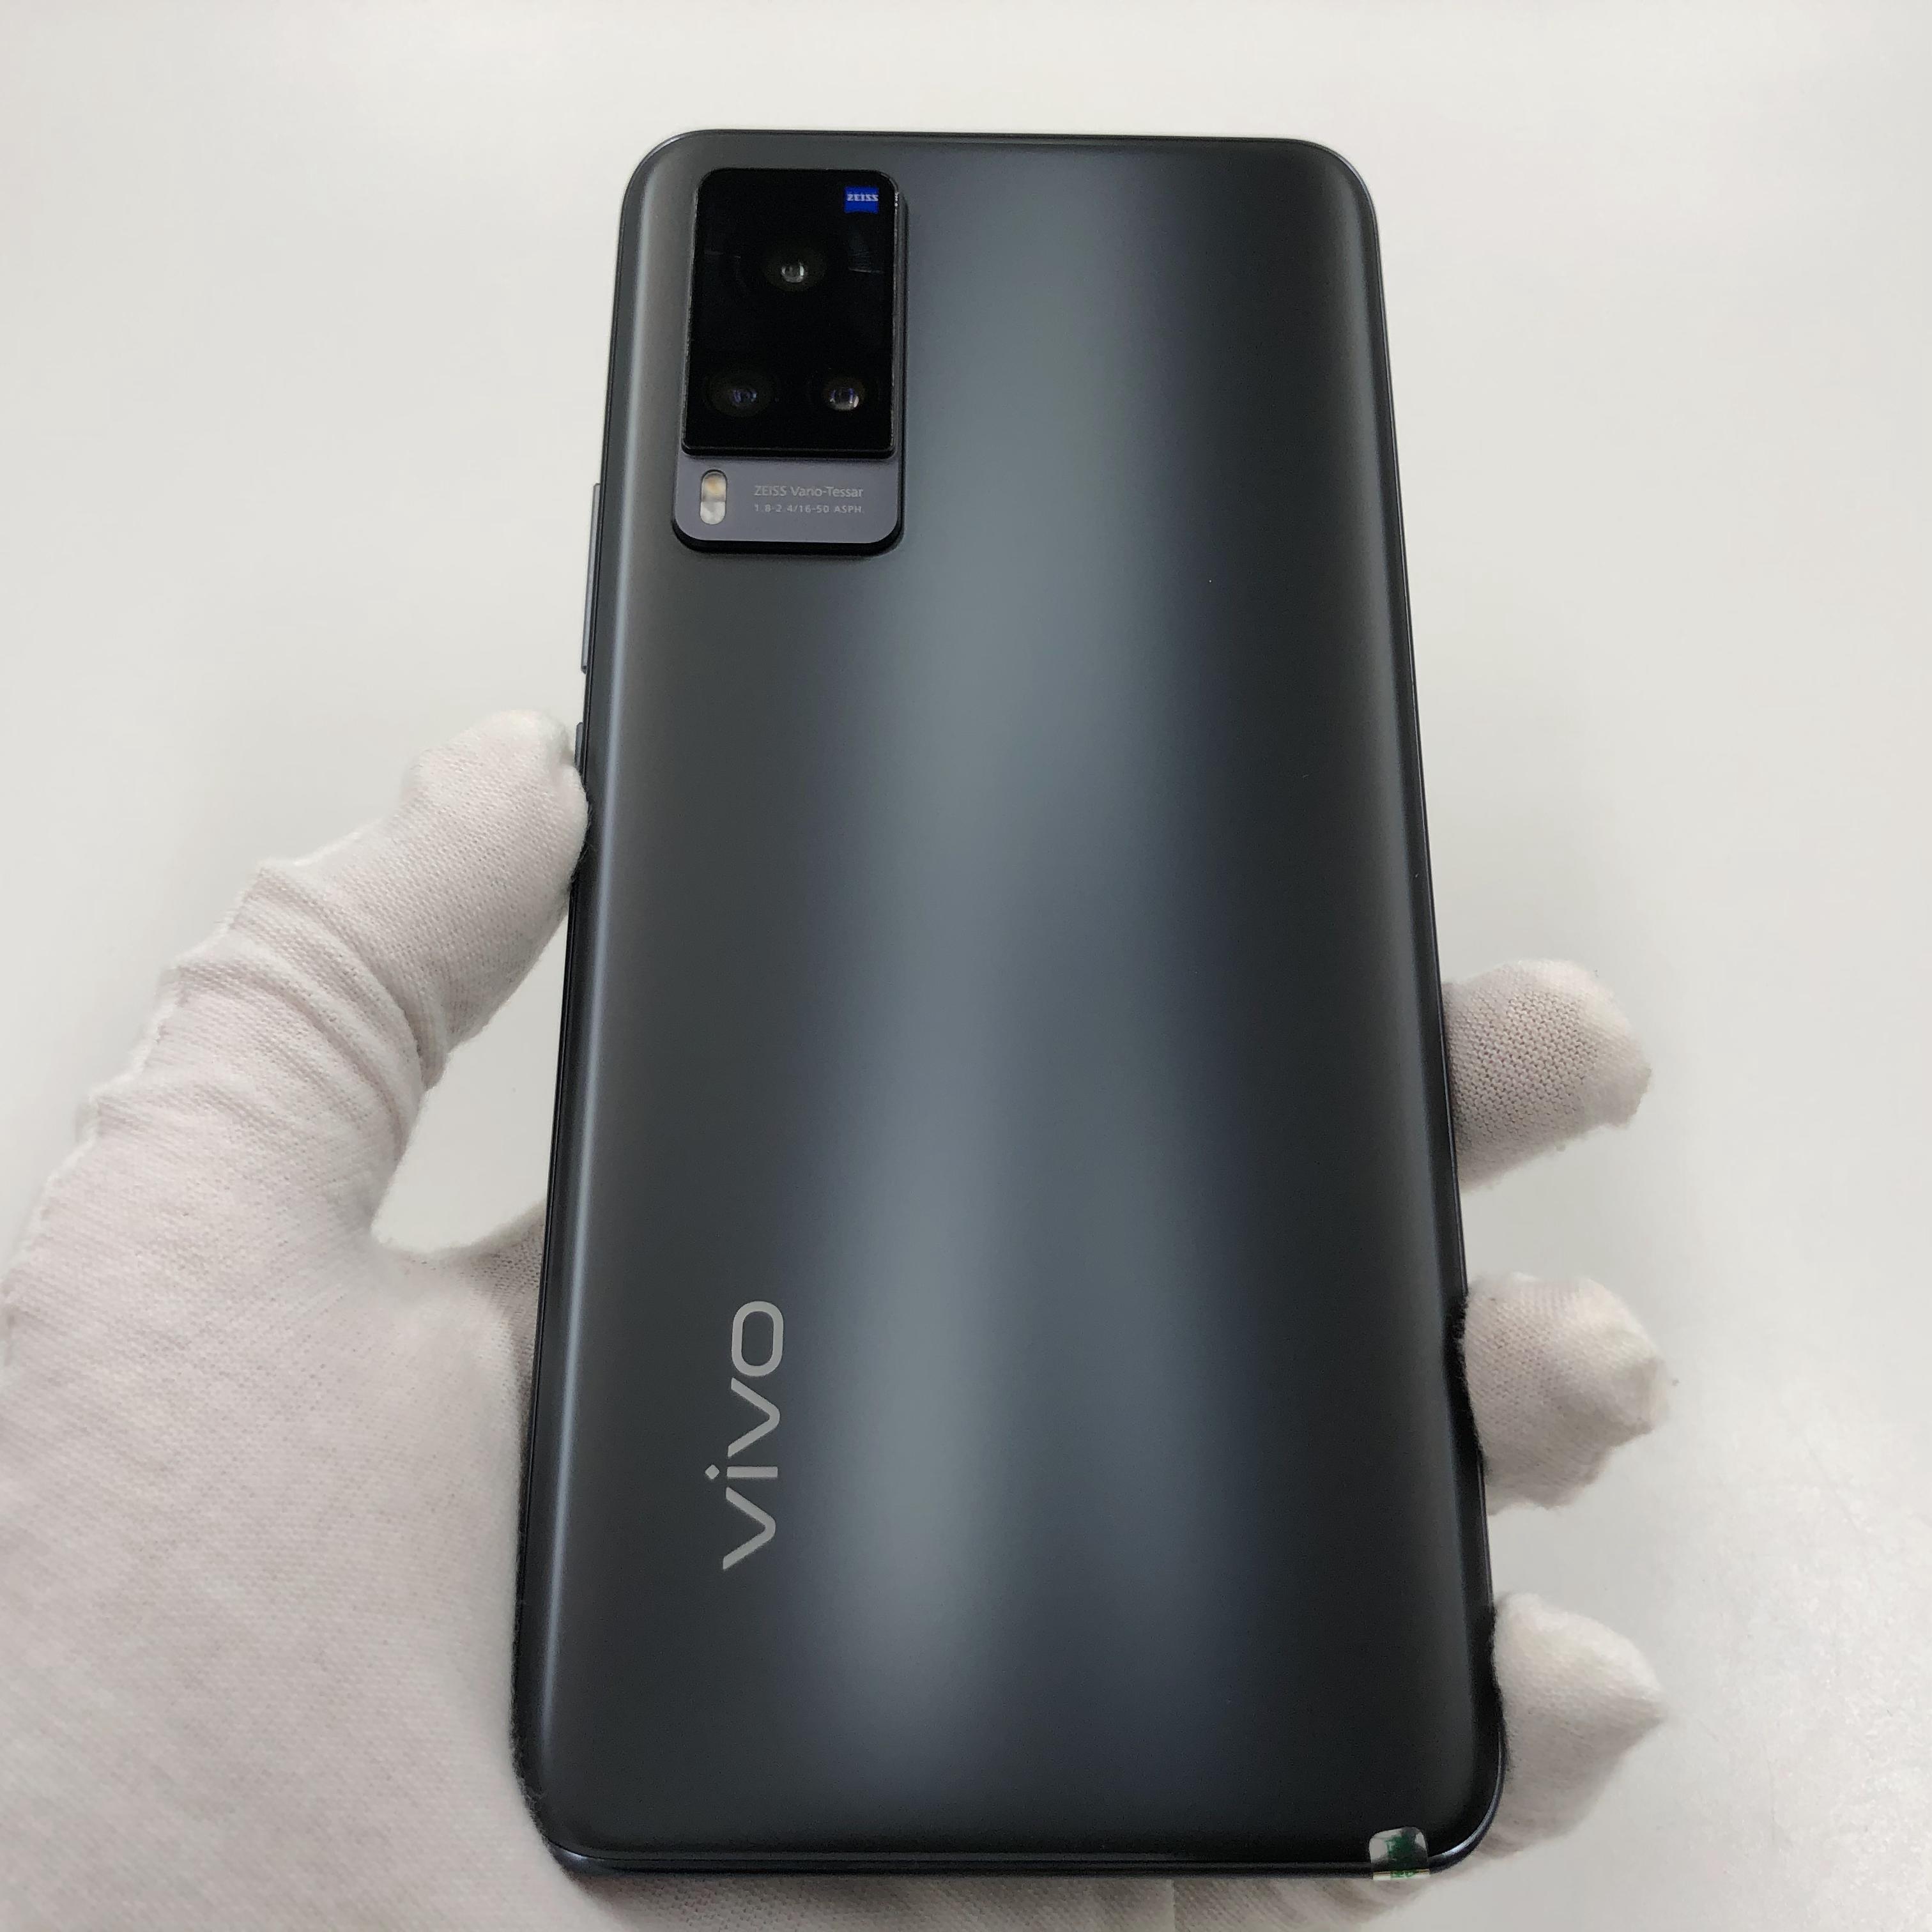 vivo【X60 5G】5G全网通 原力 8G/256G 国行 95新 真机实拍